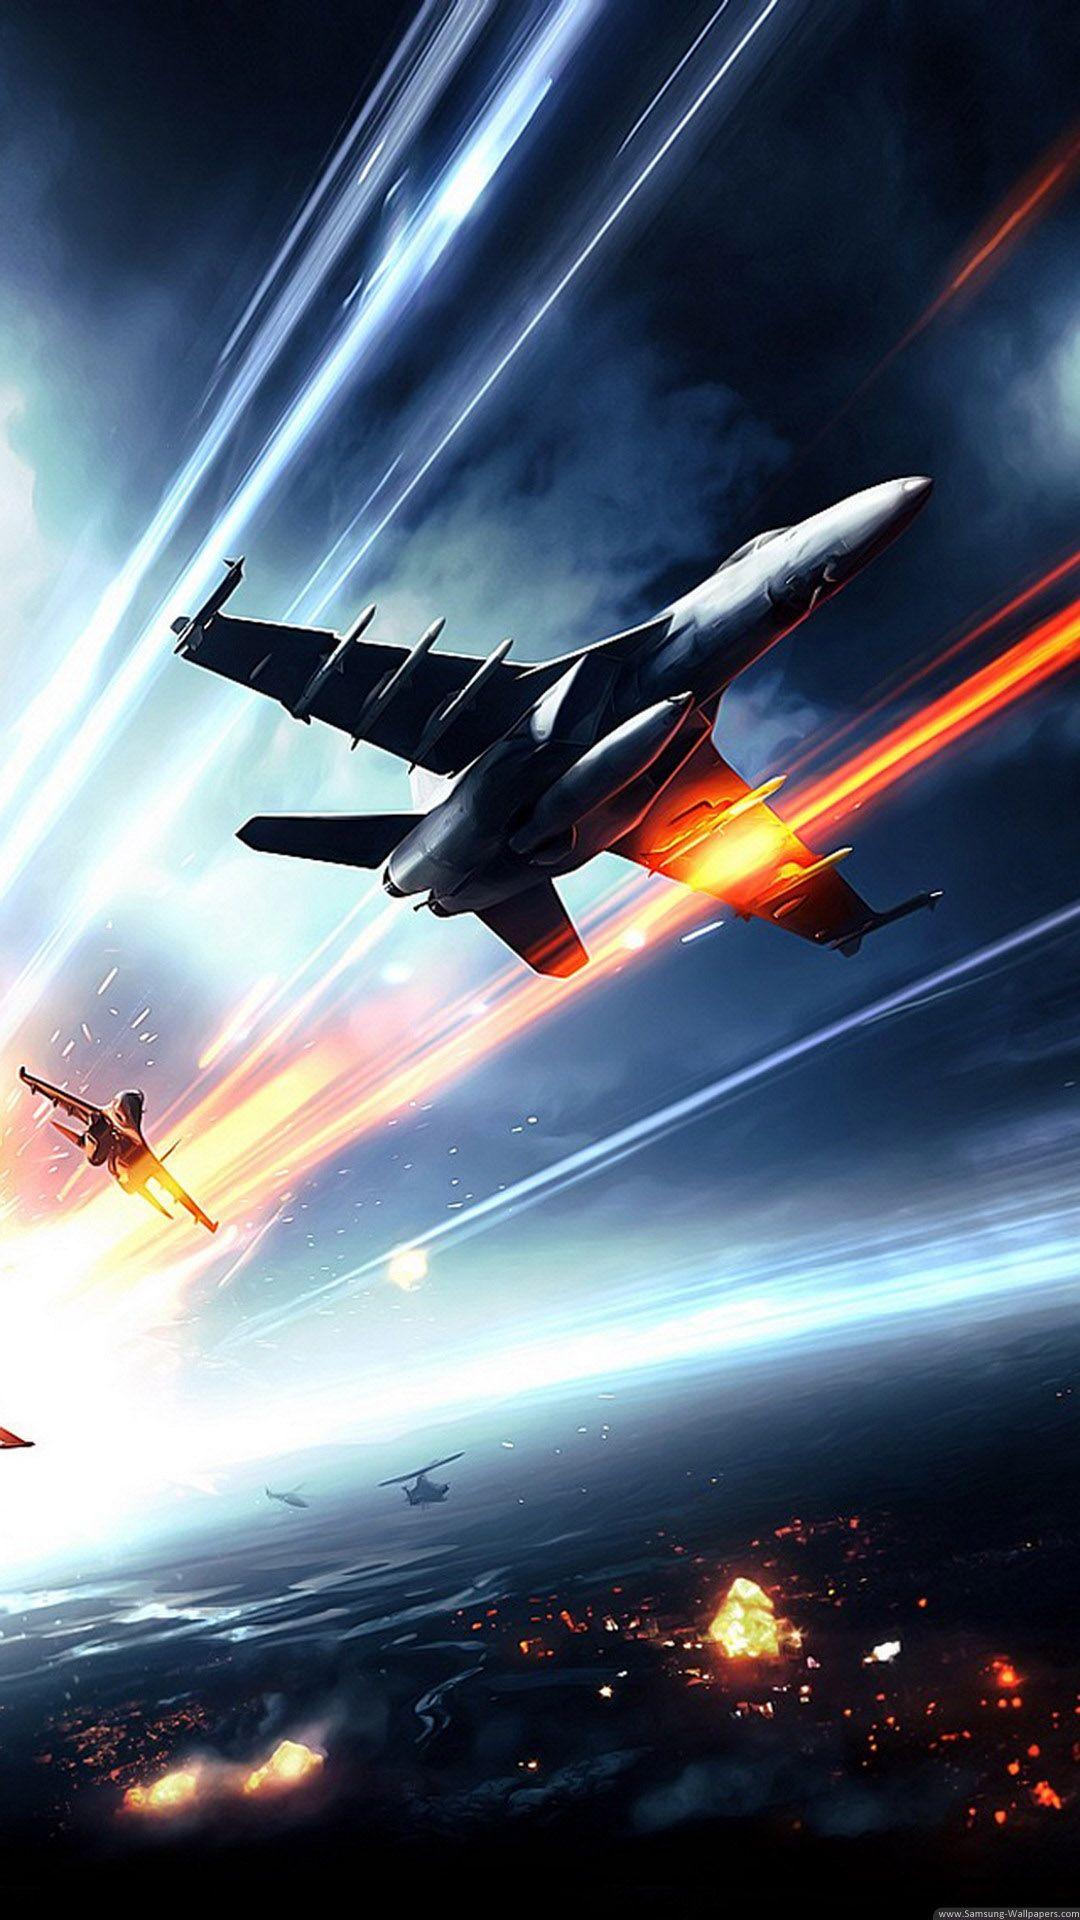 Battlefield 3 Jet Fighters Iphone 6 Plus Hd Wallpaper Phone